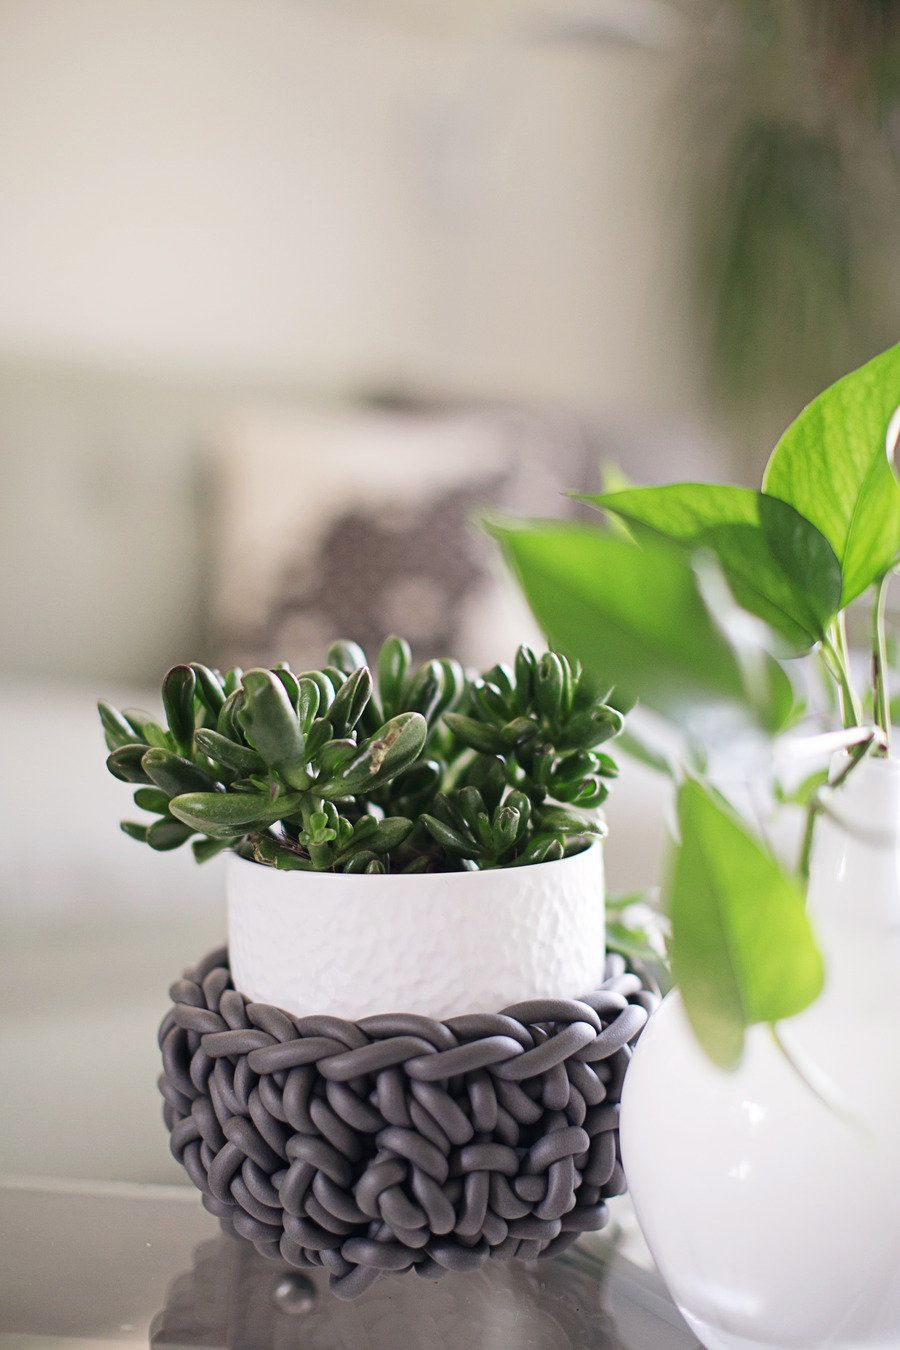 #succulent, #potted-plants, #plants  Photography: Heidi Geldhauser - ourlaboroflovebyheidi.com/ Design & Styling: Christina Loucks - christinaloucks.wordpress.com/  Read More: http://www.stylemepretty.com/living/2013/07/08/christina-loucks-home-tour/